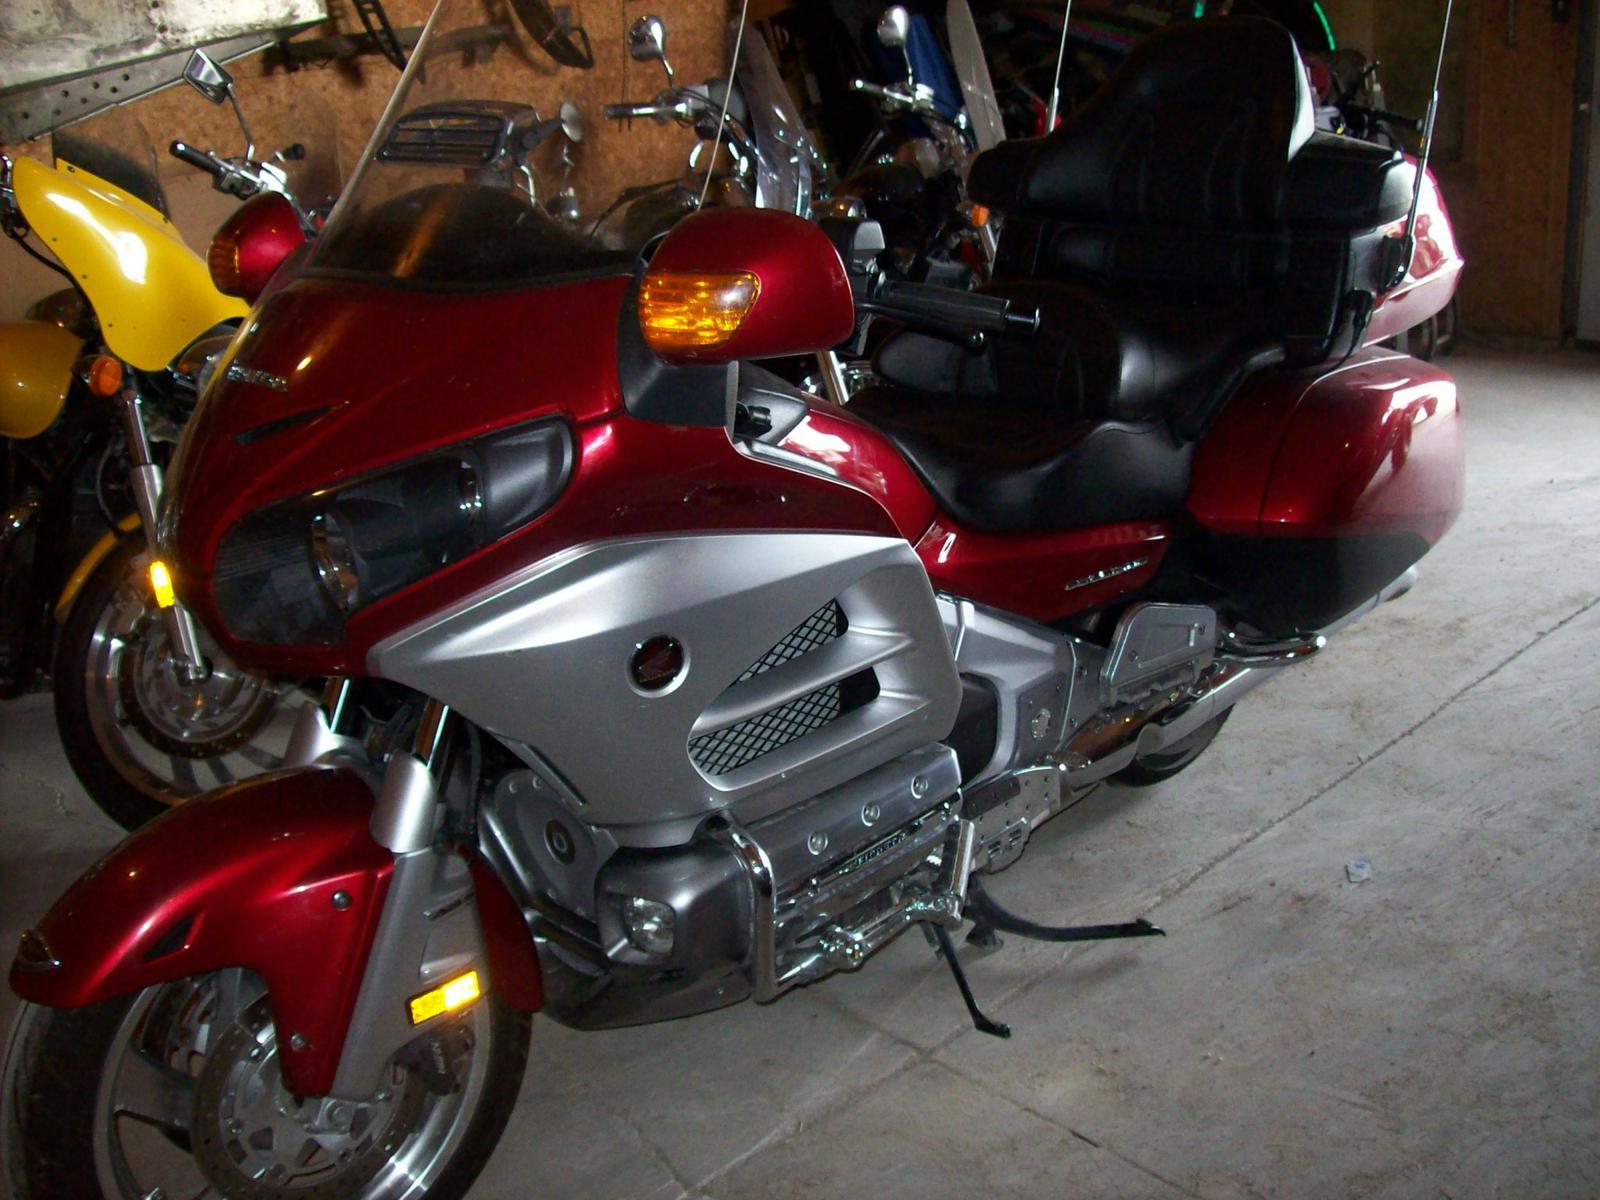 2012 Honda Gl1800ah For Sale In Wingham On Lynn Hoy Enterprises Prolite Seat Post Carbon 316mm Silver Stock